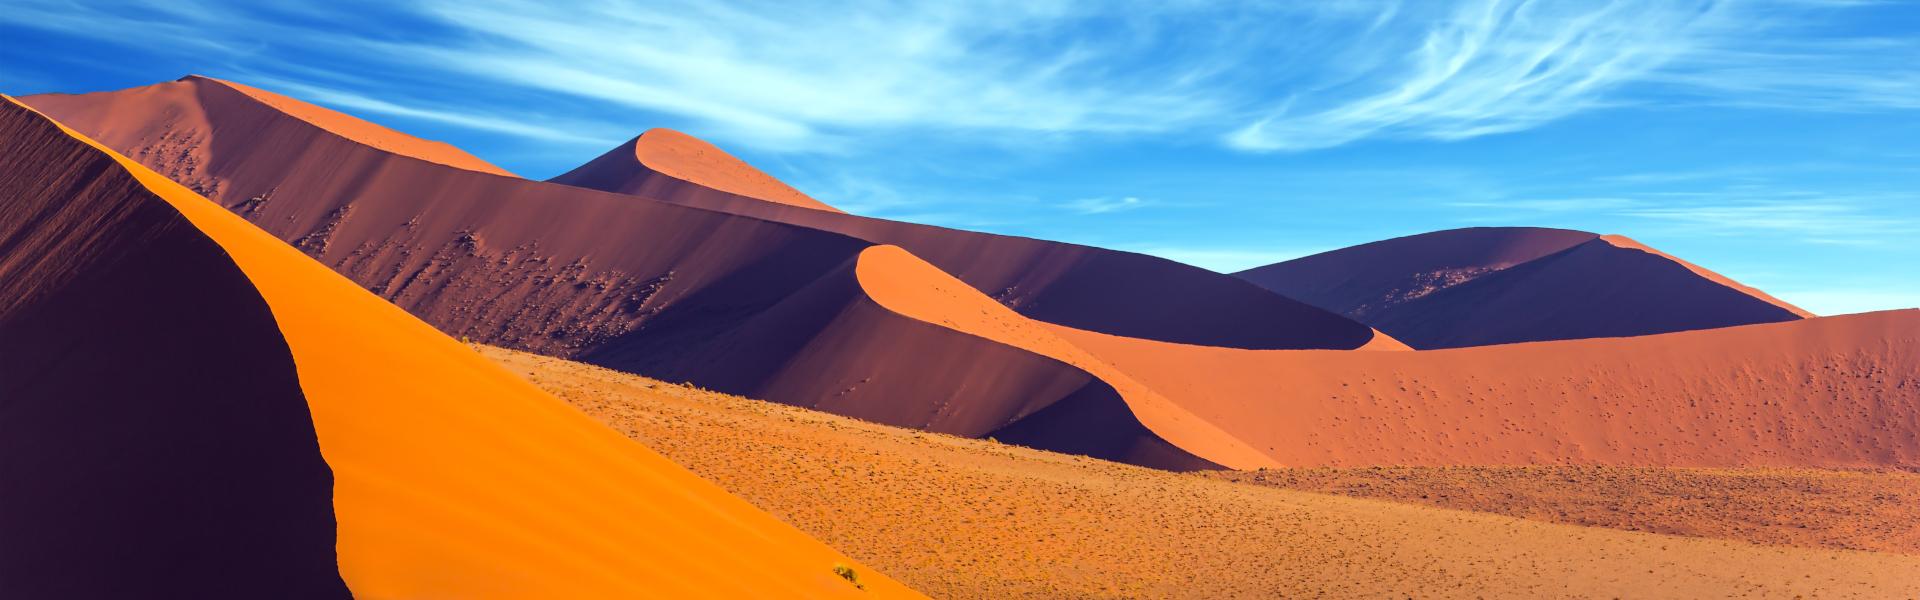 Südafrika & Namibia: Von Kapstadt nach Windhuk